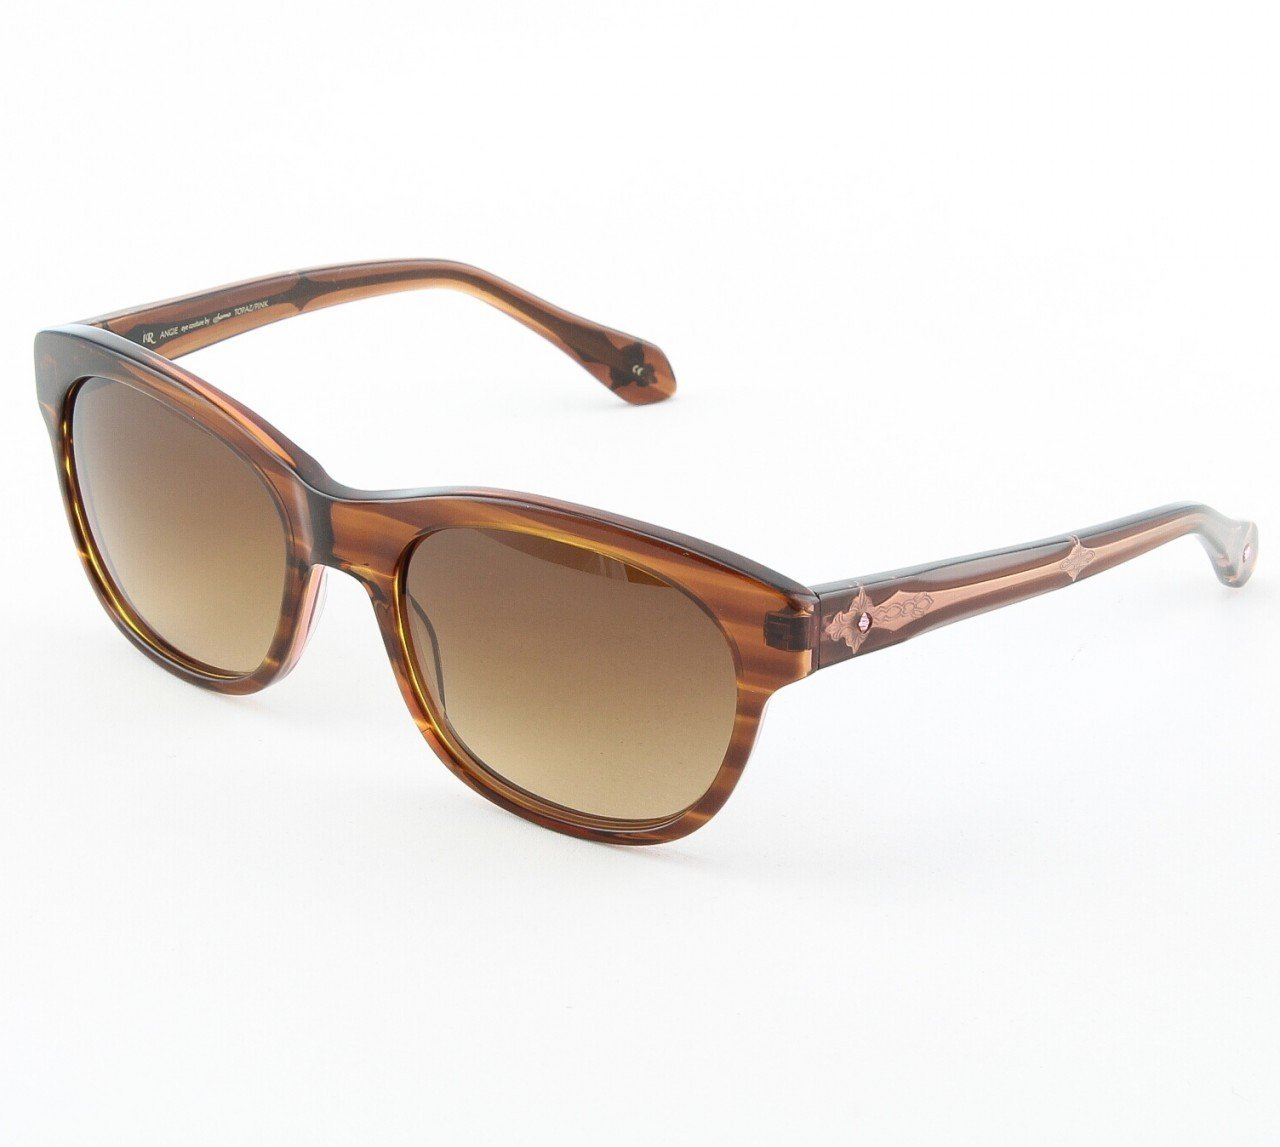 Loree Rodkin Angie Sunglasses Topaz/Pink w/ Brown Gradient Lenses & Swarovski Crystals